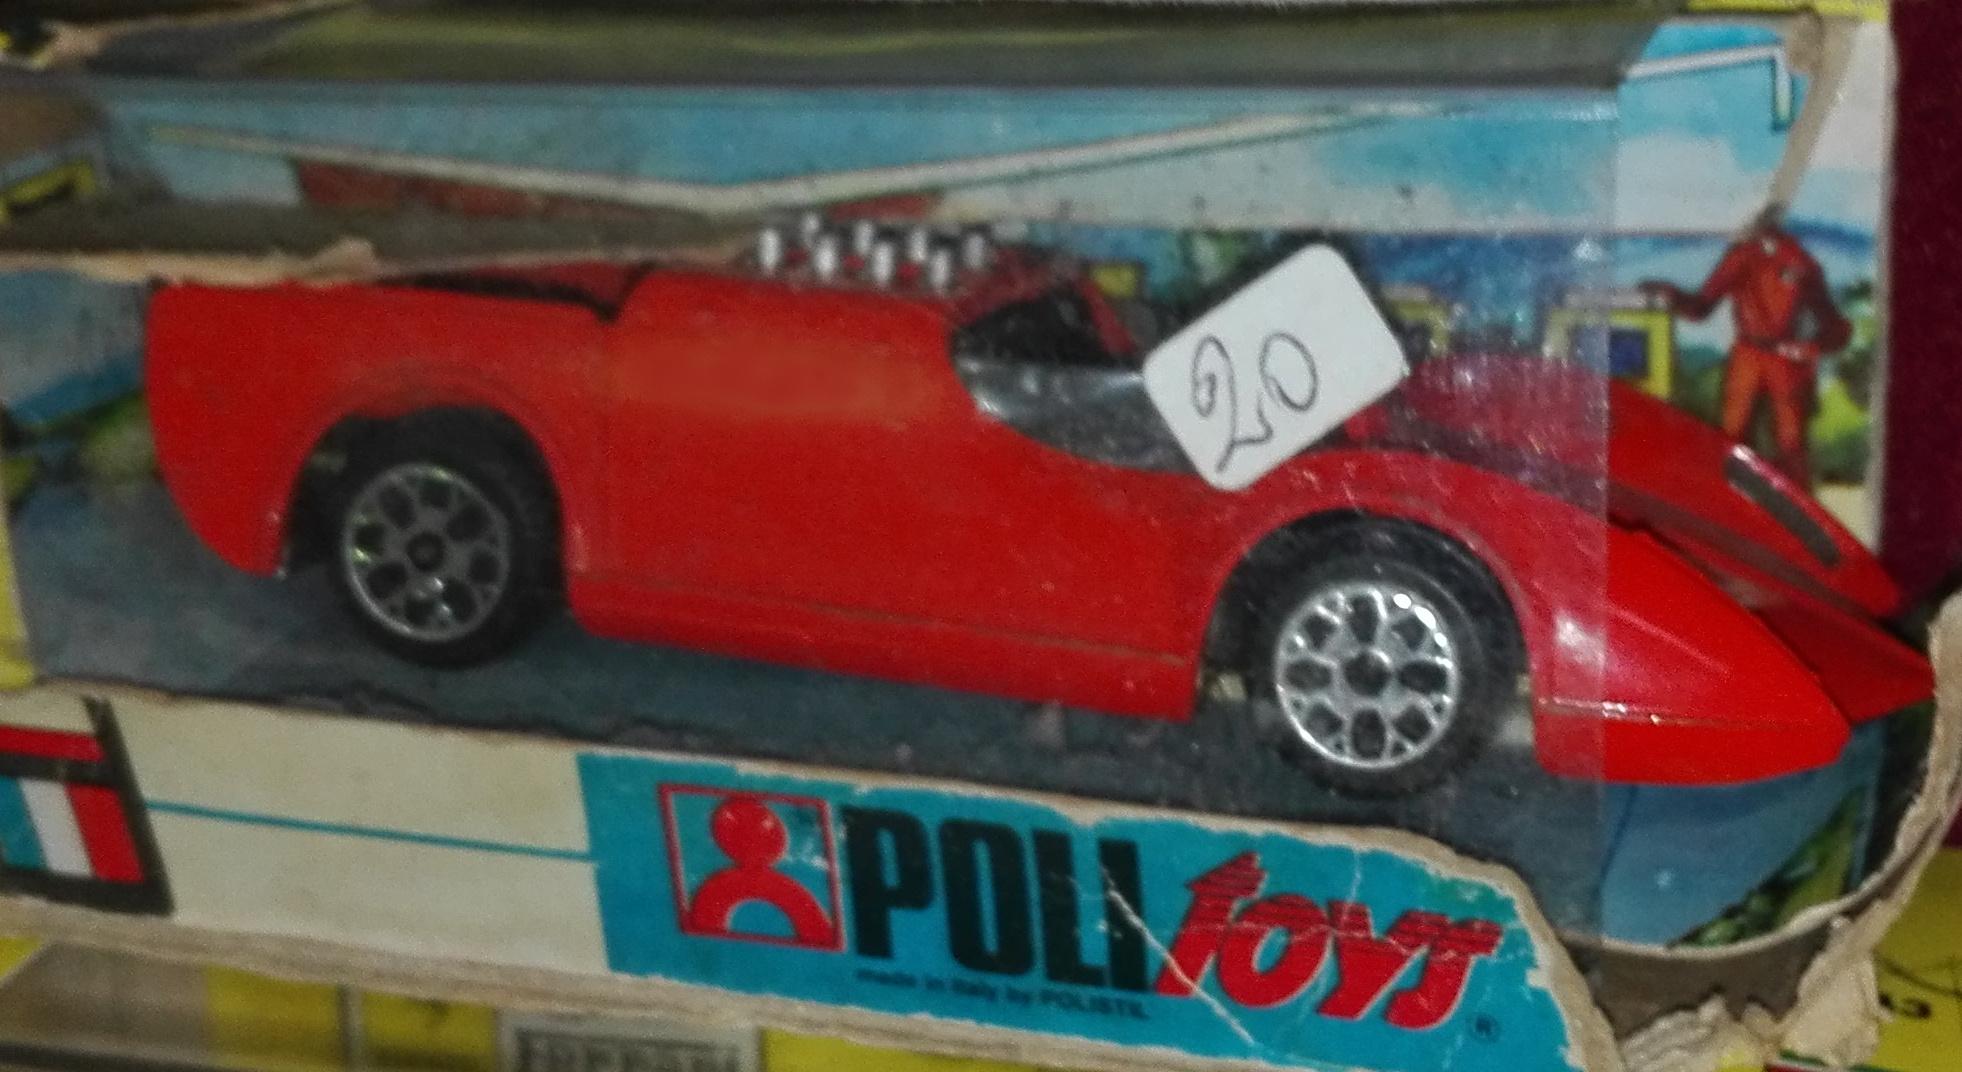 E28, AMC Phaze II 343 V8